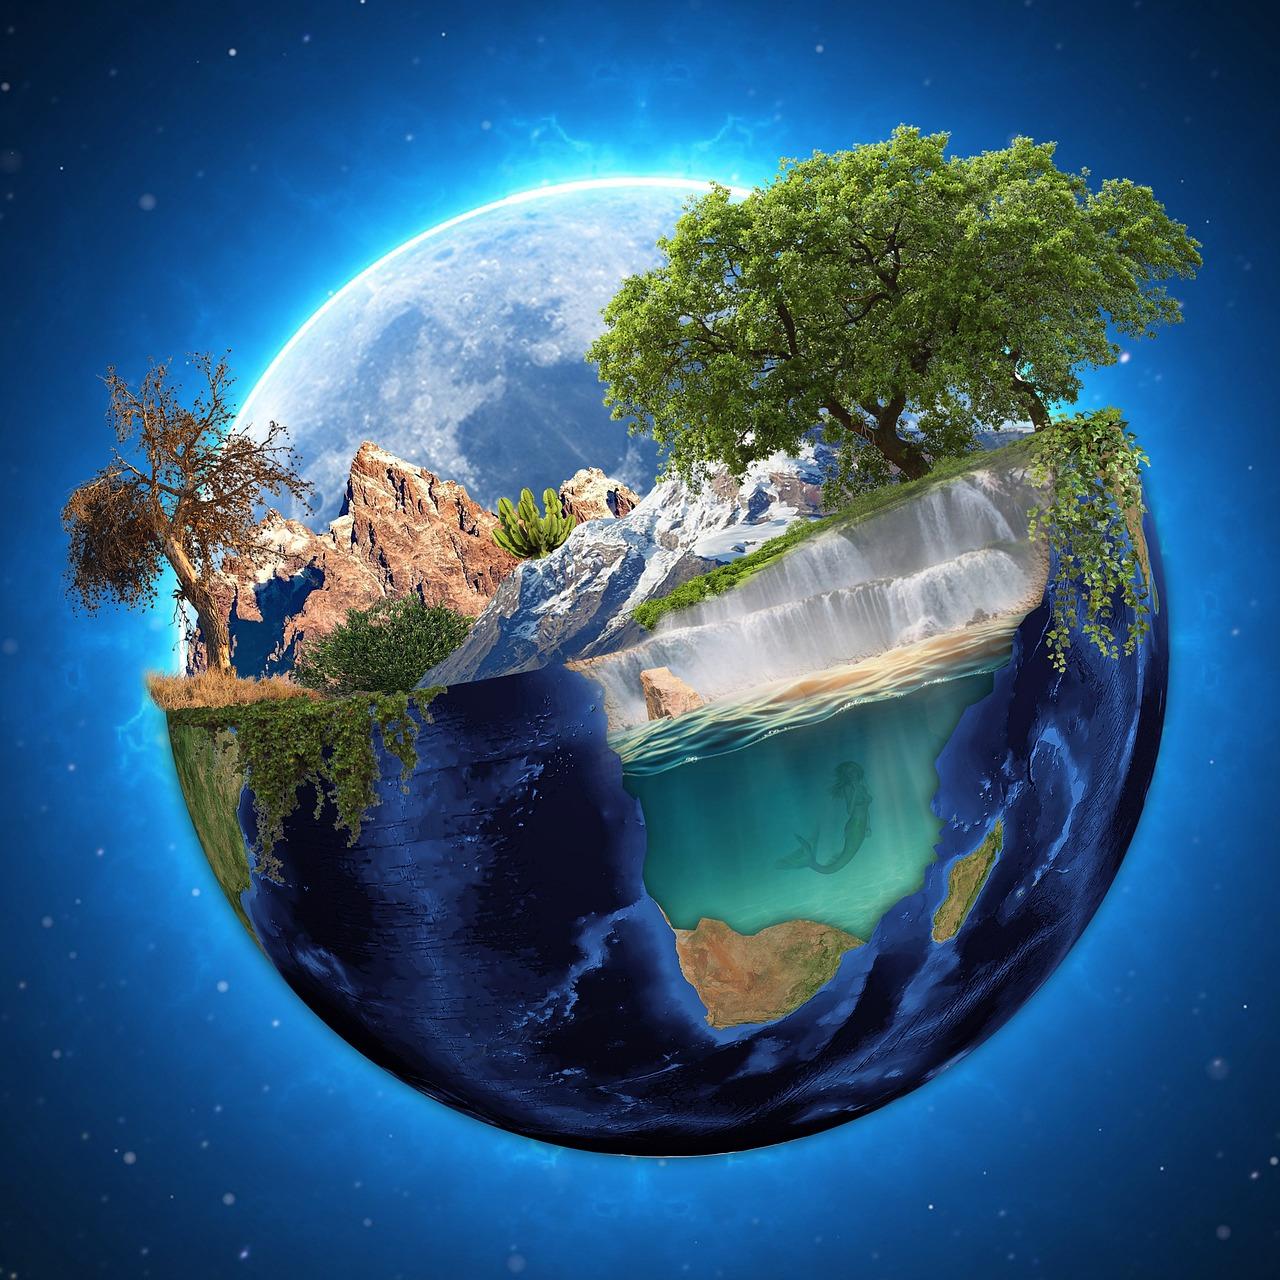 Earth Sky Space - Free photo on Pixabay